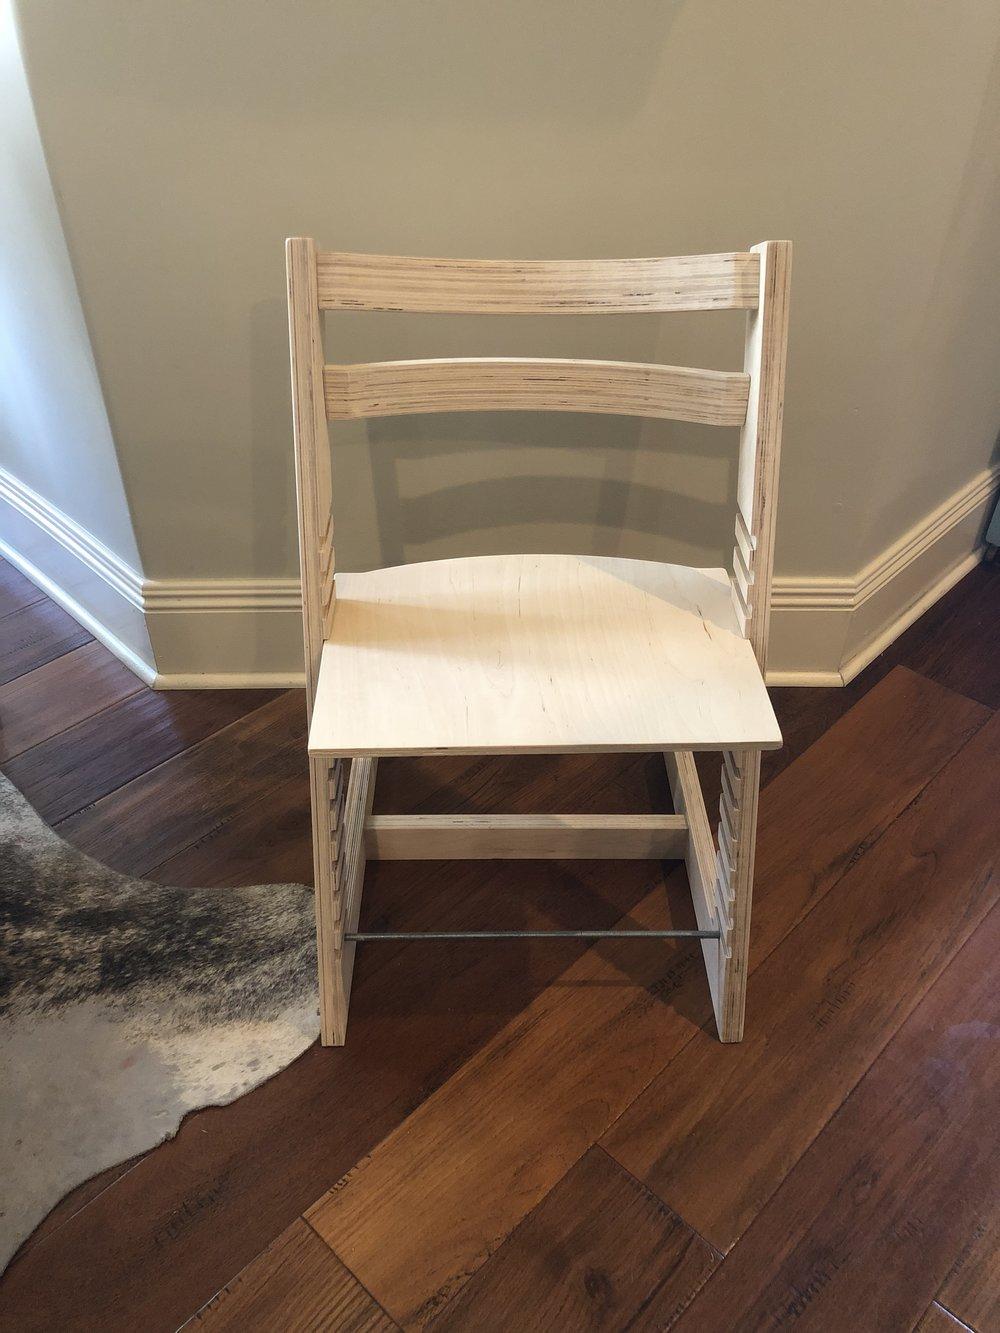 clintloggins Tripptrapp chair2.jpeg